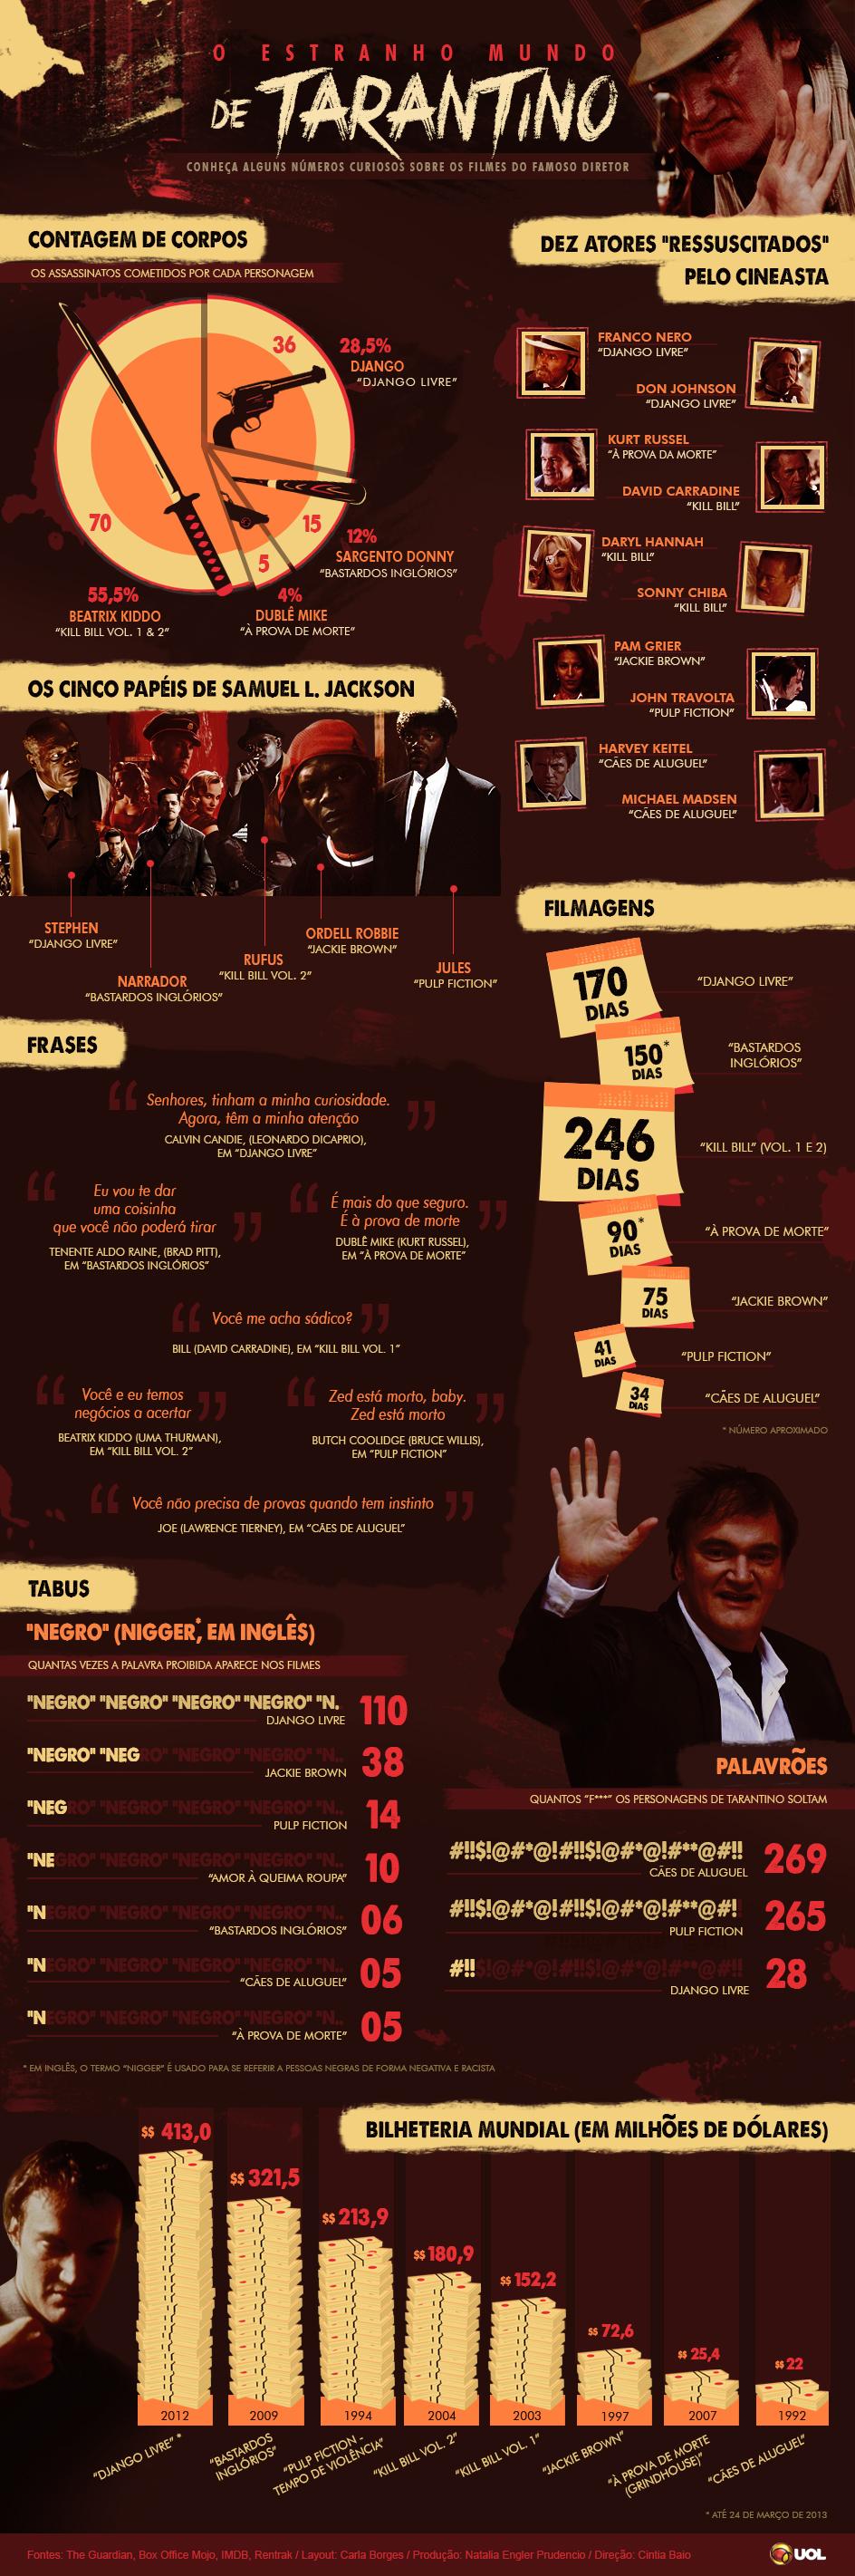 Quentin Tarantino Info-mundo-tarantino